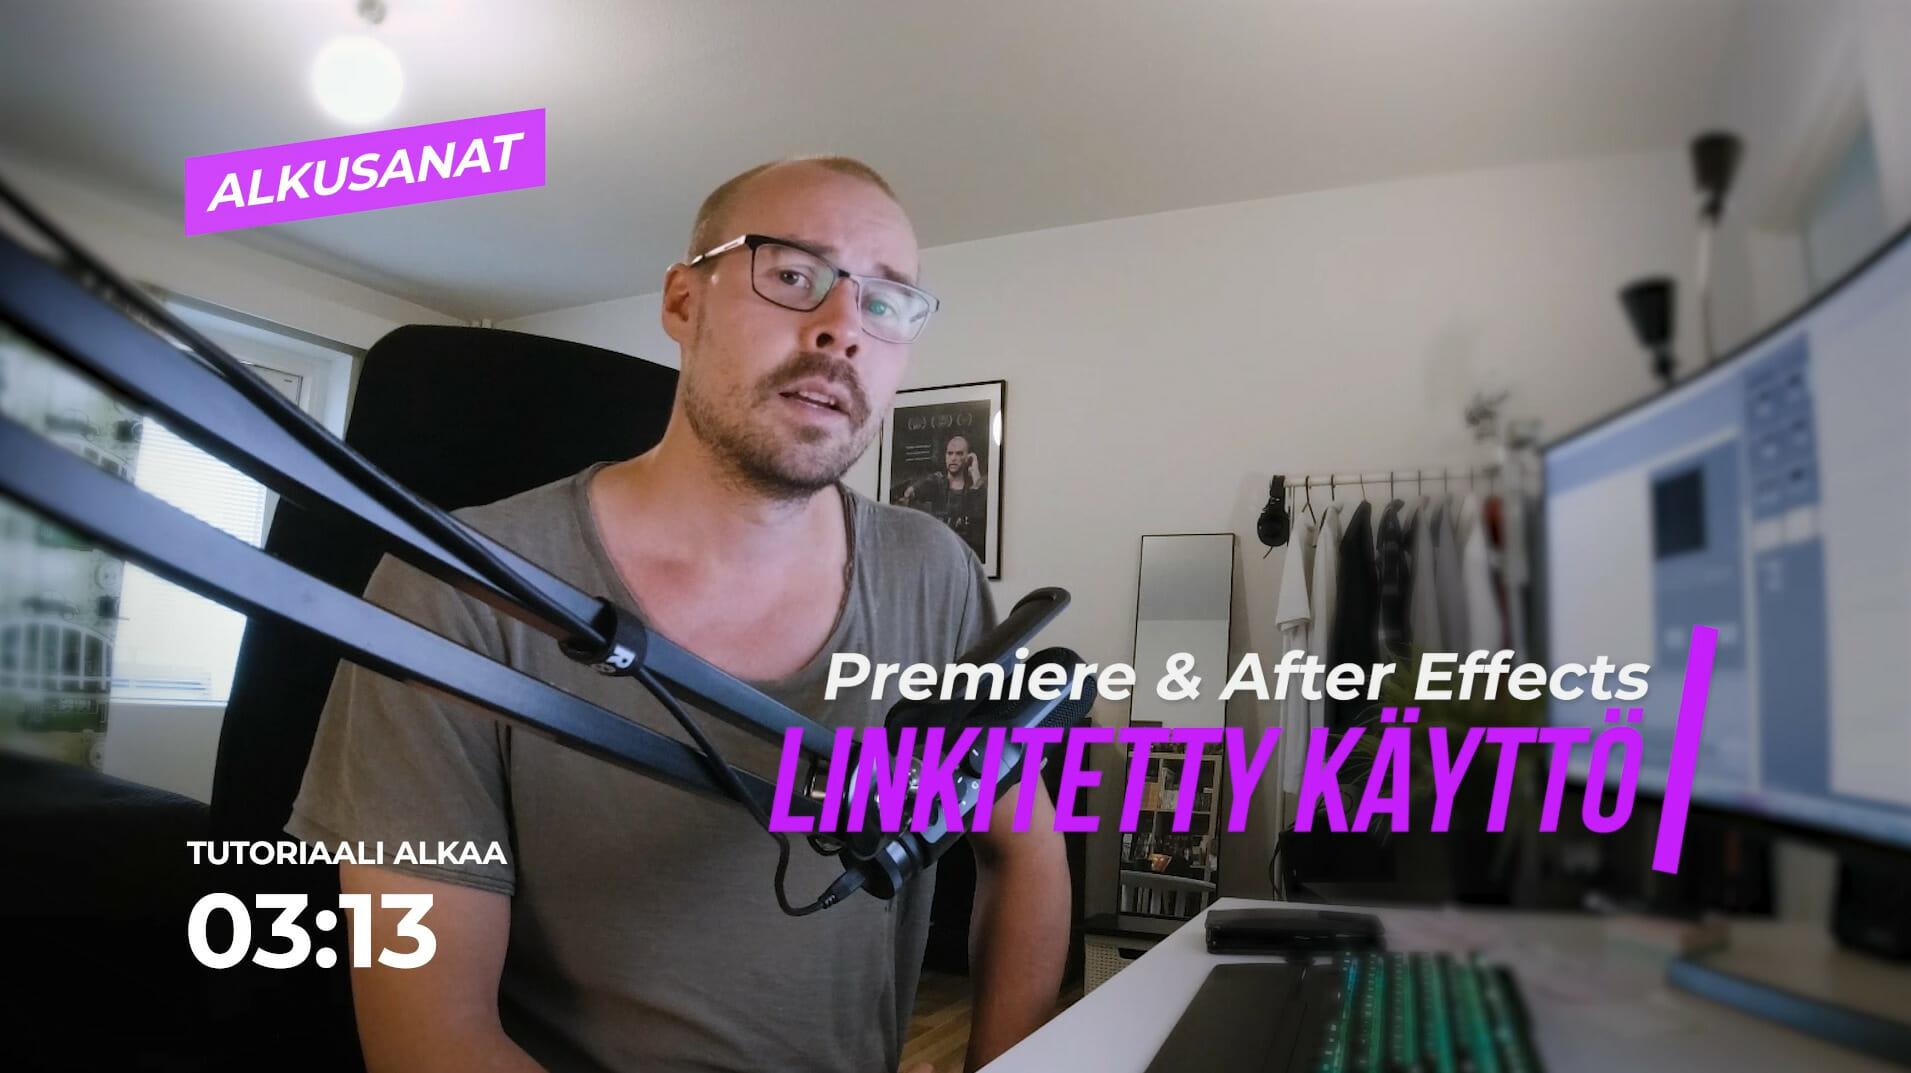 Adobe Premiere pro ja After Effects linkitetty käyttö alkusanat